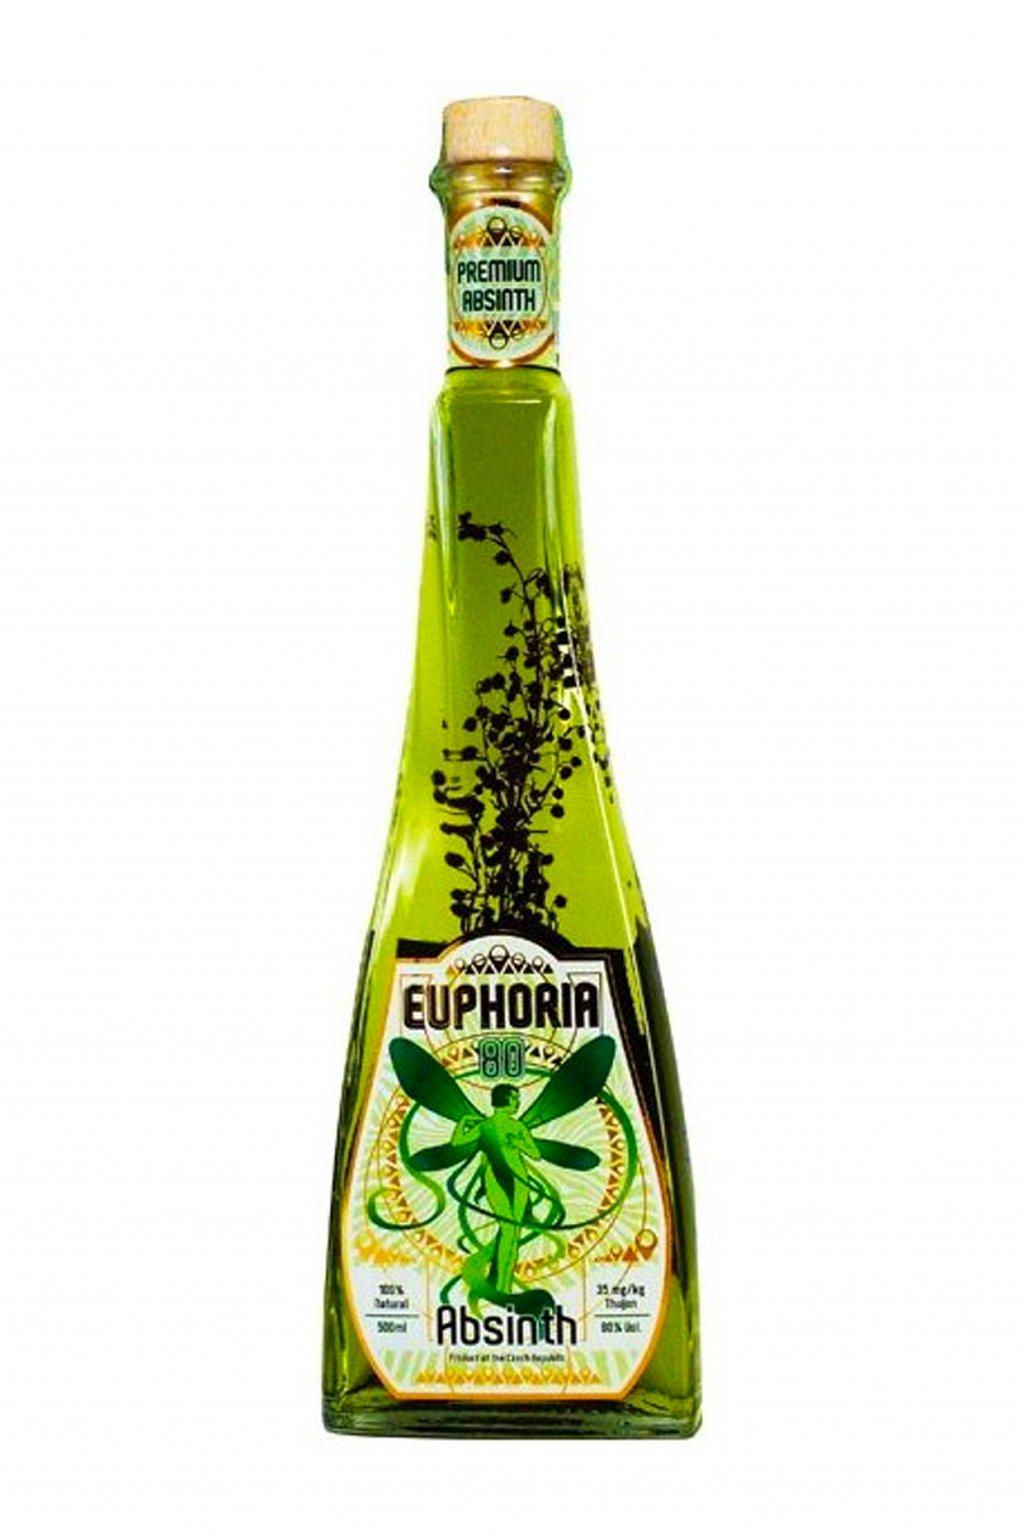 Absinth Euphoria